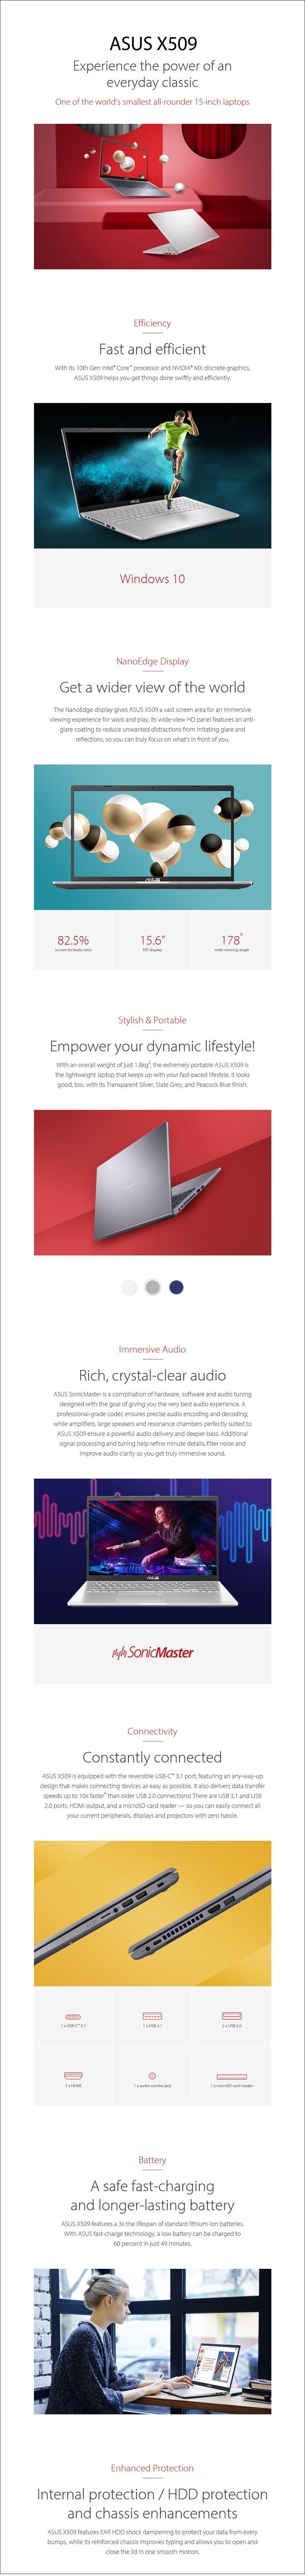 "ASUS X509JB-BR167T 15.6"" Laptop i5-1035G1 8GB 512GB MX110 W10H - Overview 1"